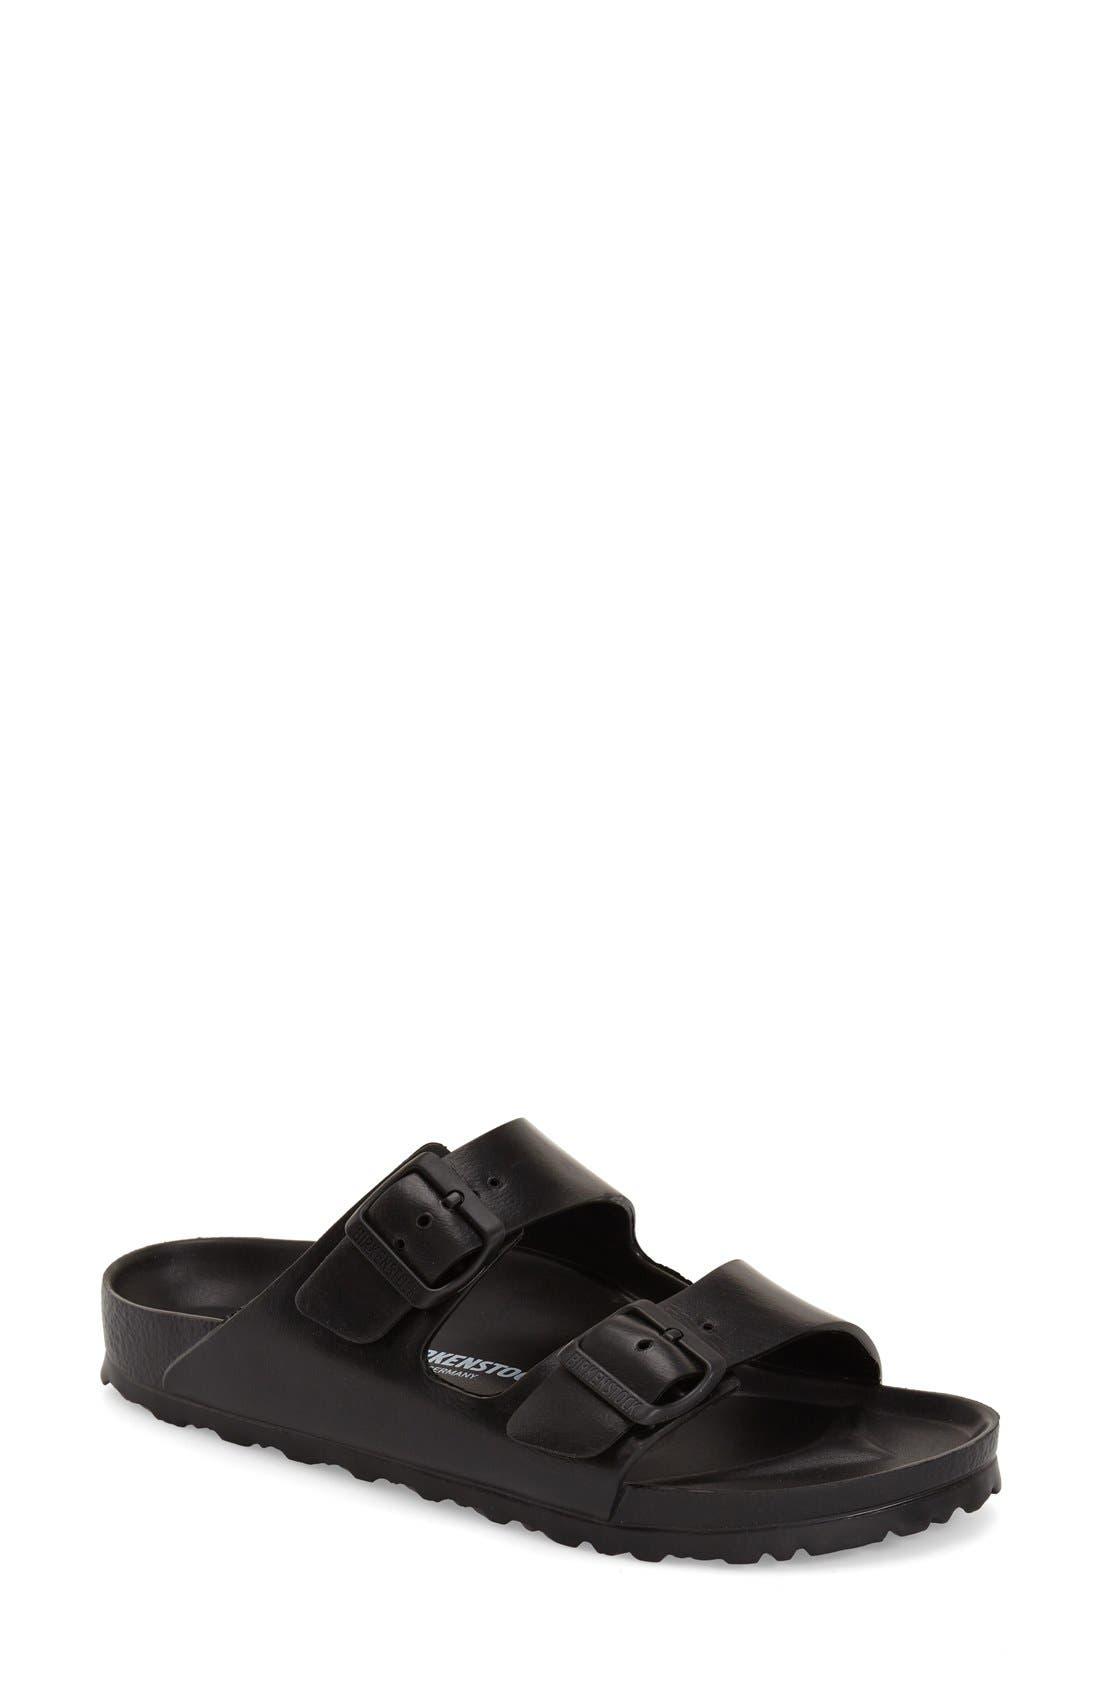 Womens sandals in size 12 - Womens Sandals In Size 12 47